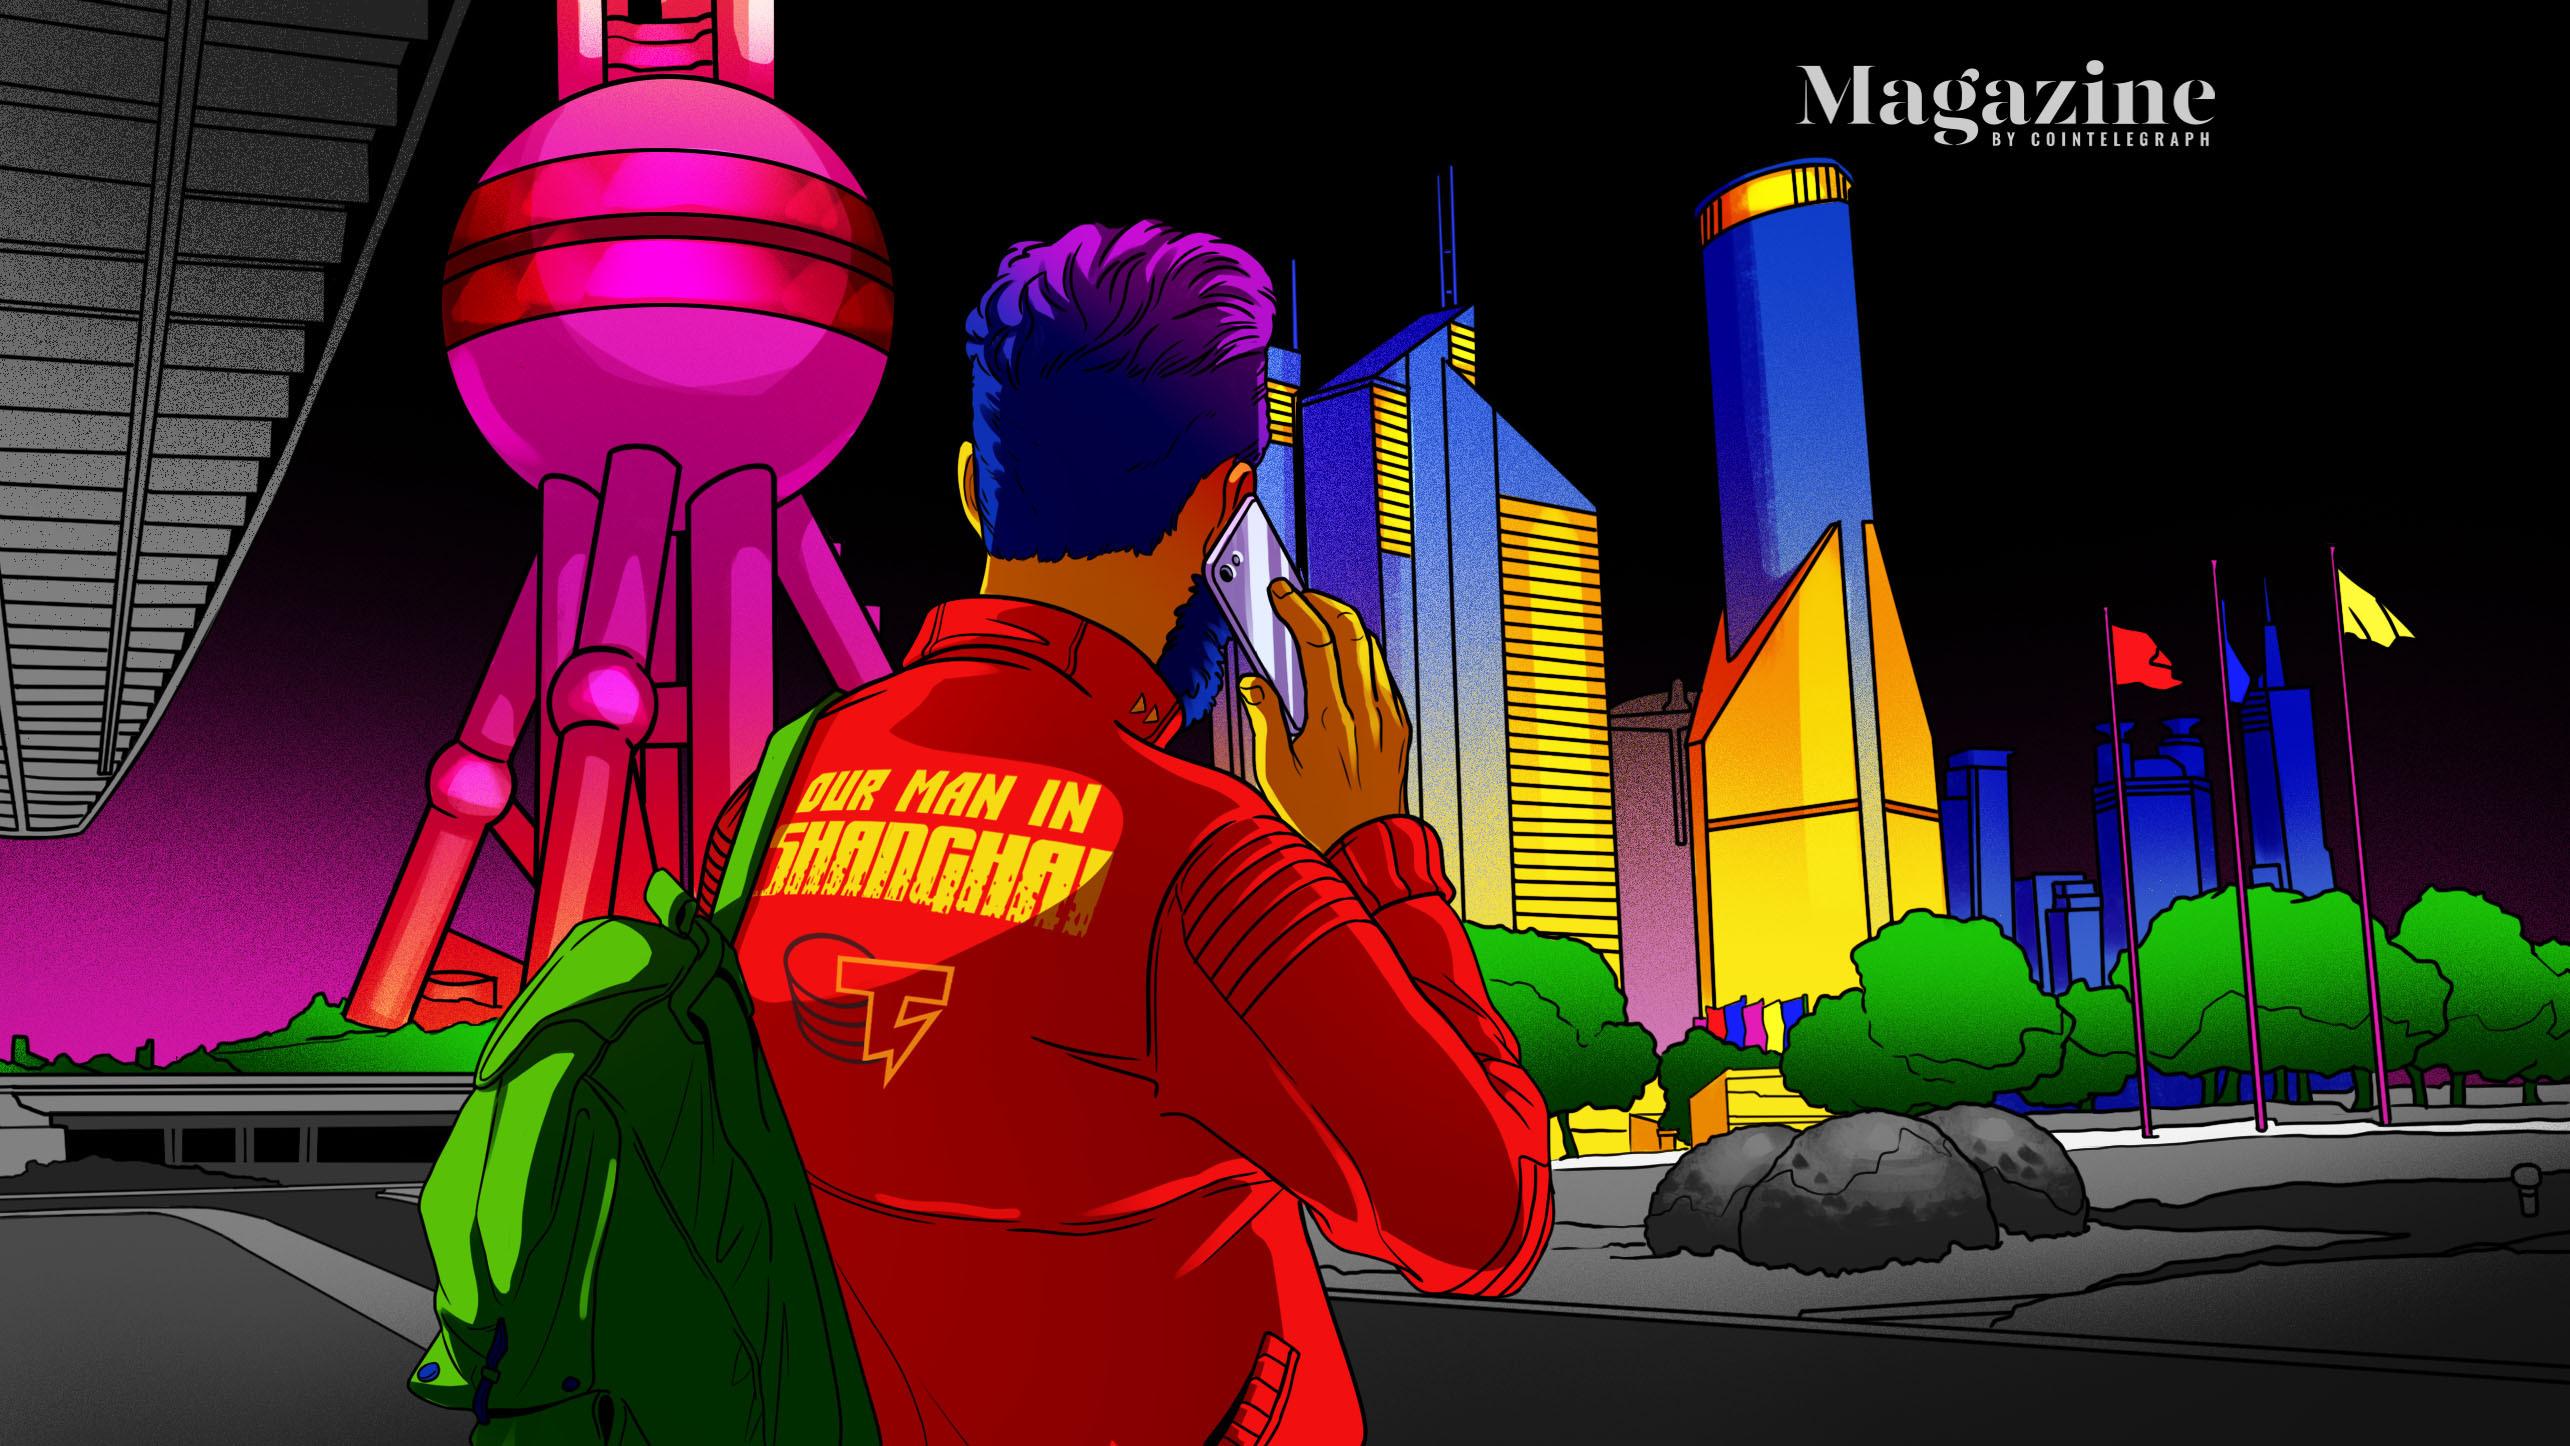 Chainlink hackathon, OKExChain nets $2B TVL, and Tencent unveils 'magic' NFT platform – Cointelegraph Magazine